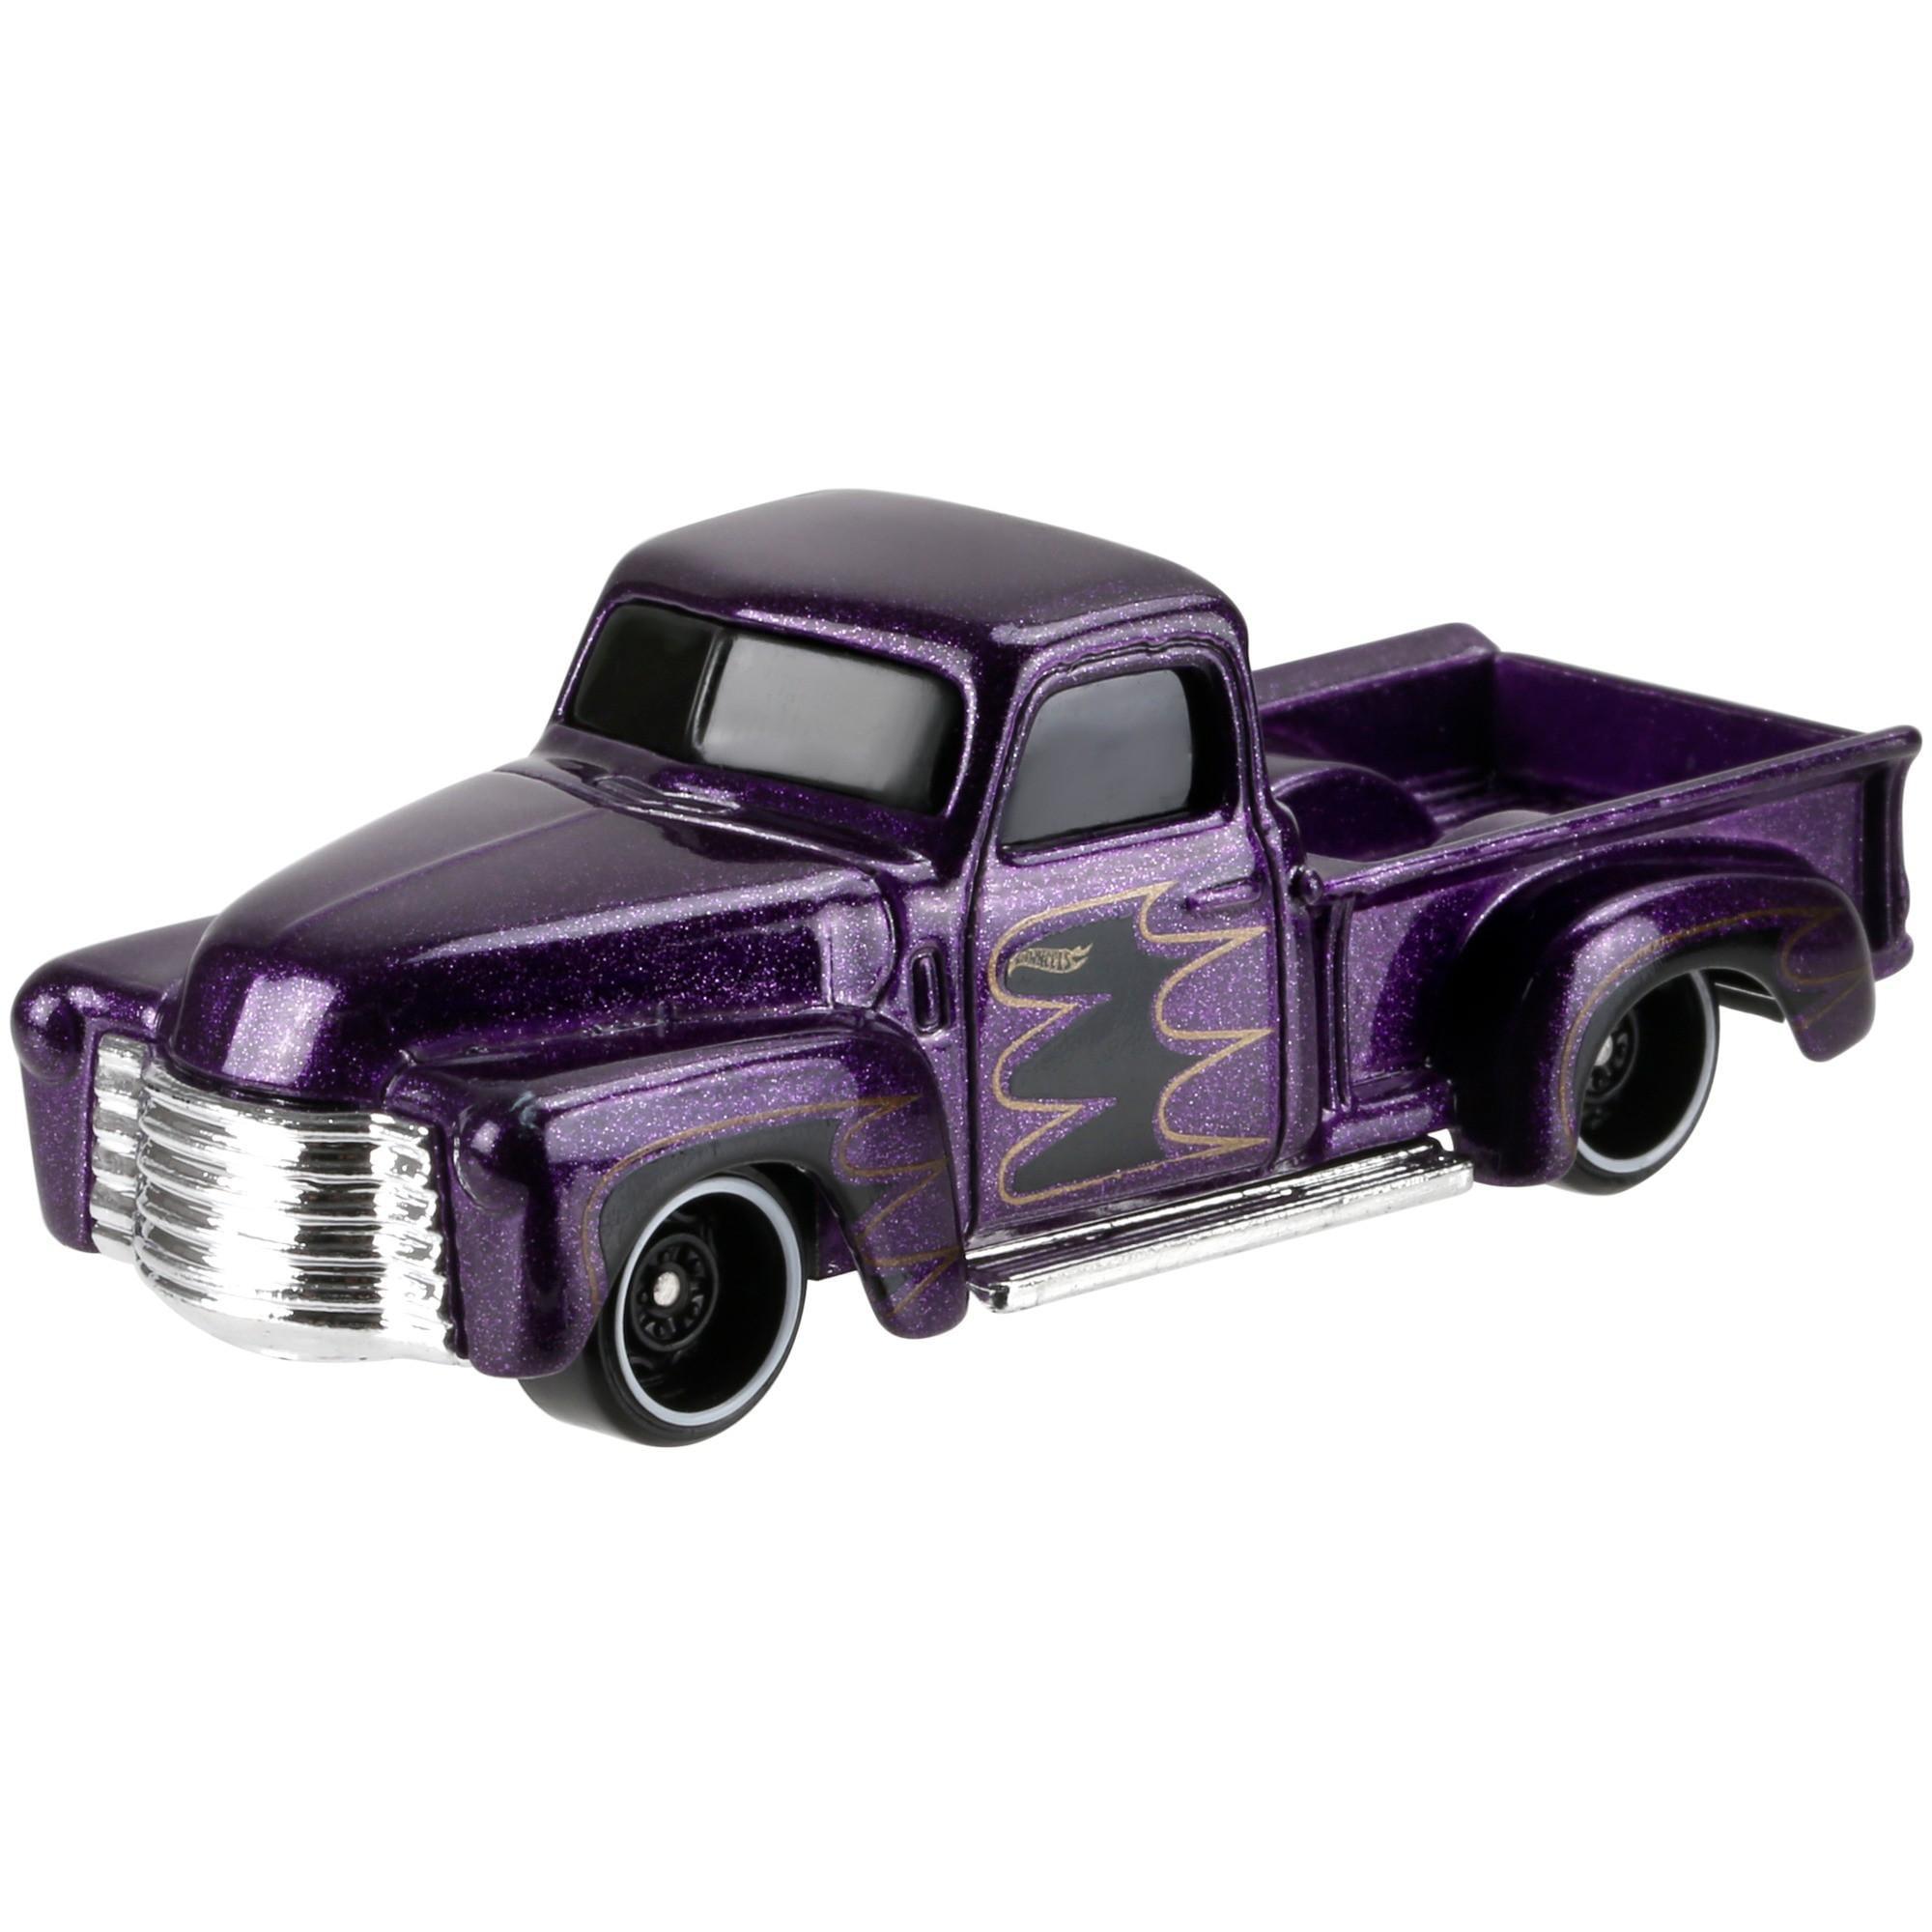 Hot Wheels Chevy Trucks 100th Anniversary Vehicle Styles May Vary Walmart Com Walmart Com